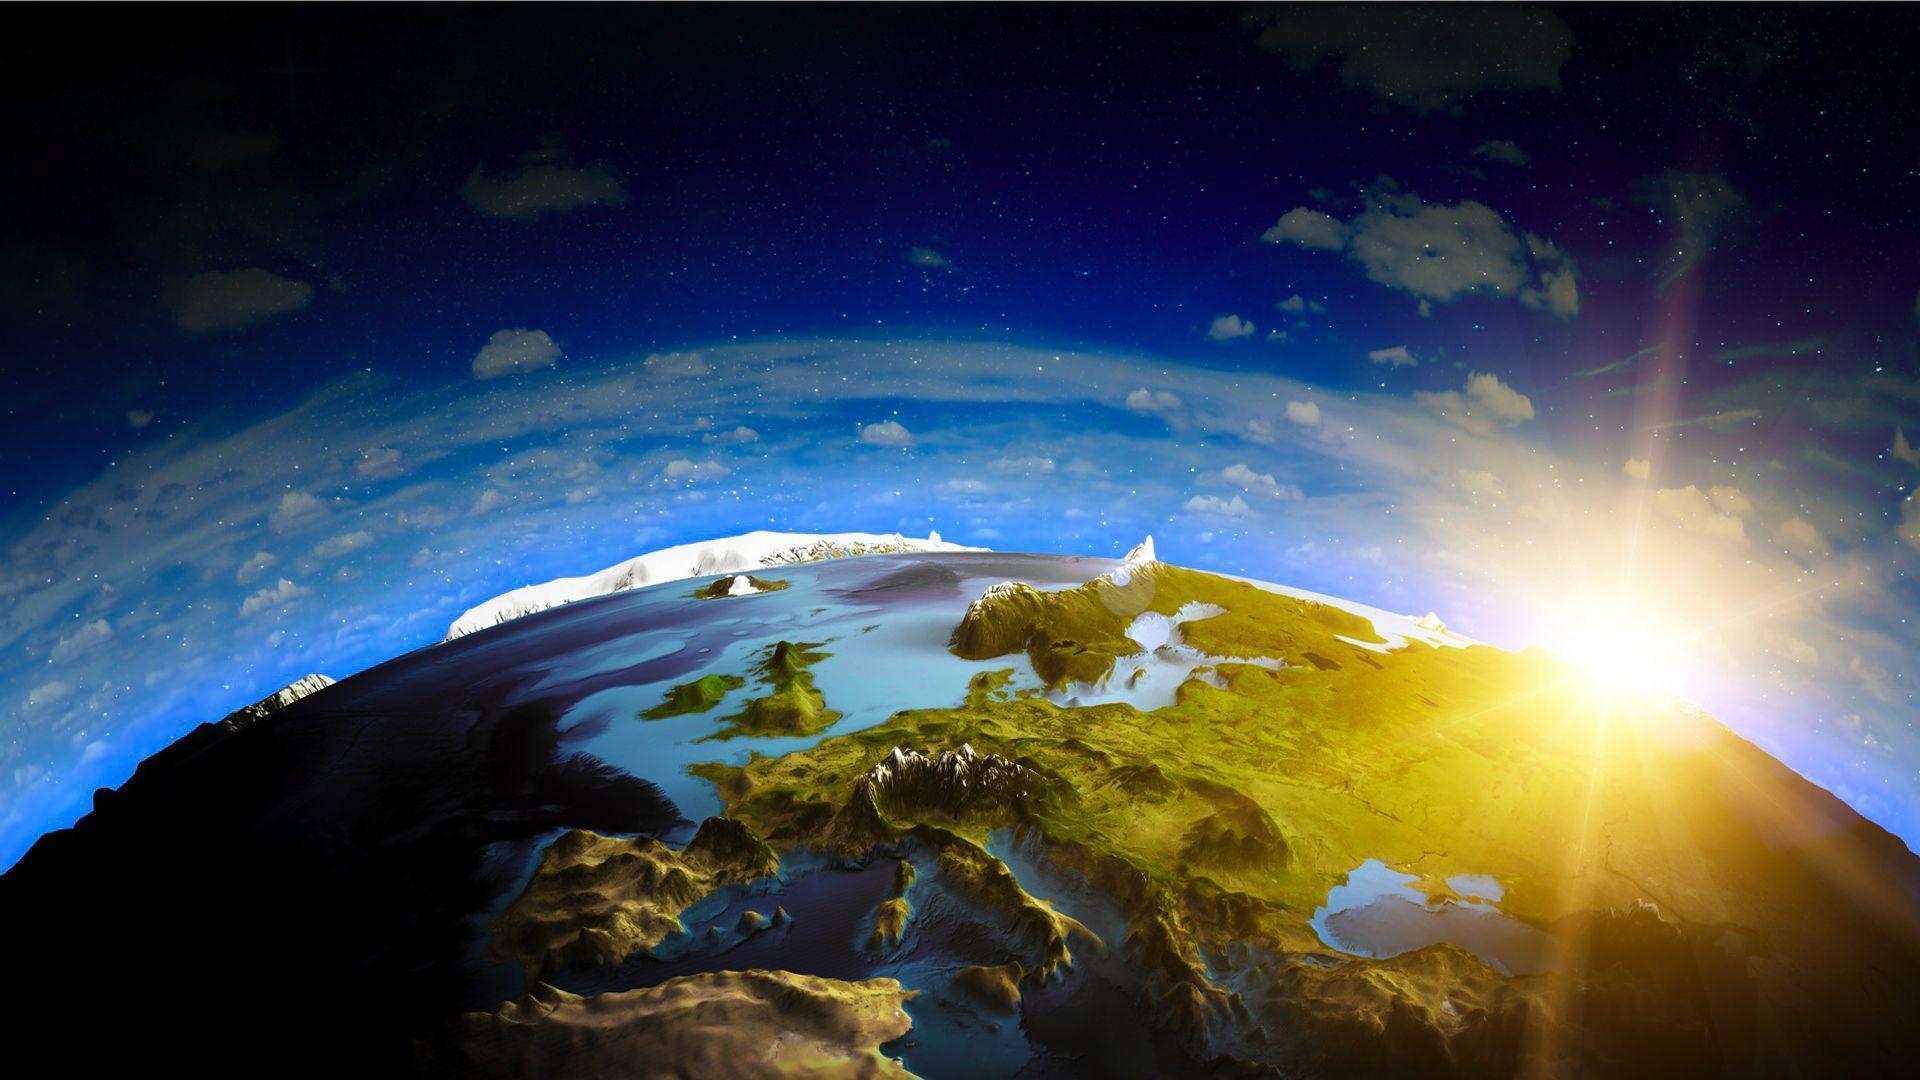 Earth Wallpaper Full Hd: Top Free 4K Earth Backgrounds